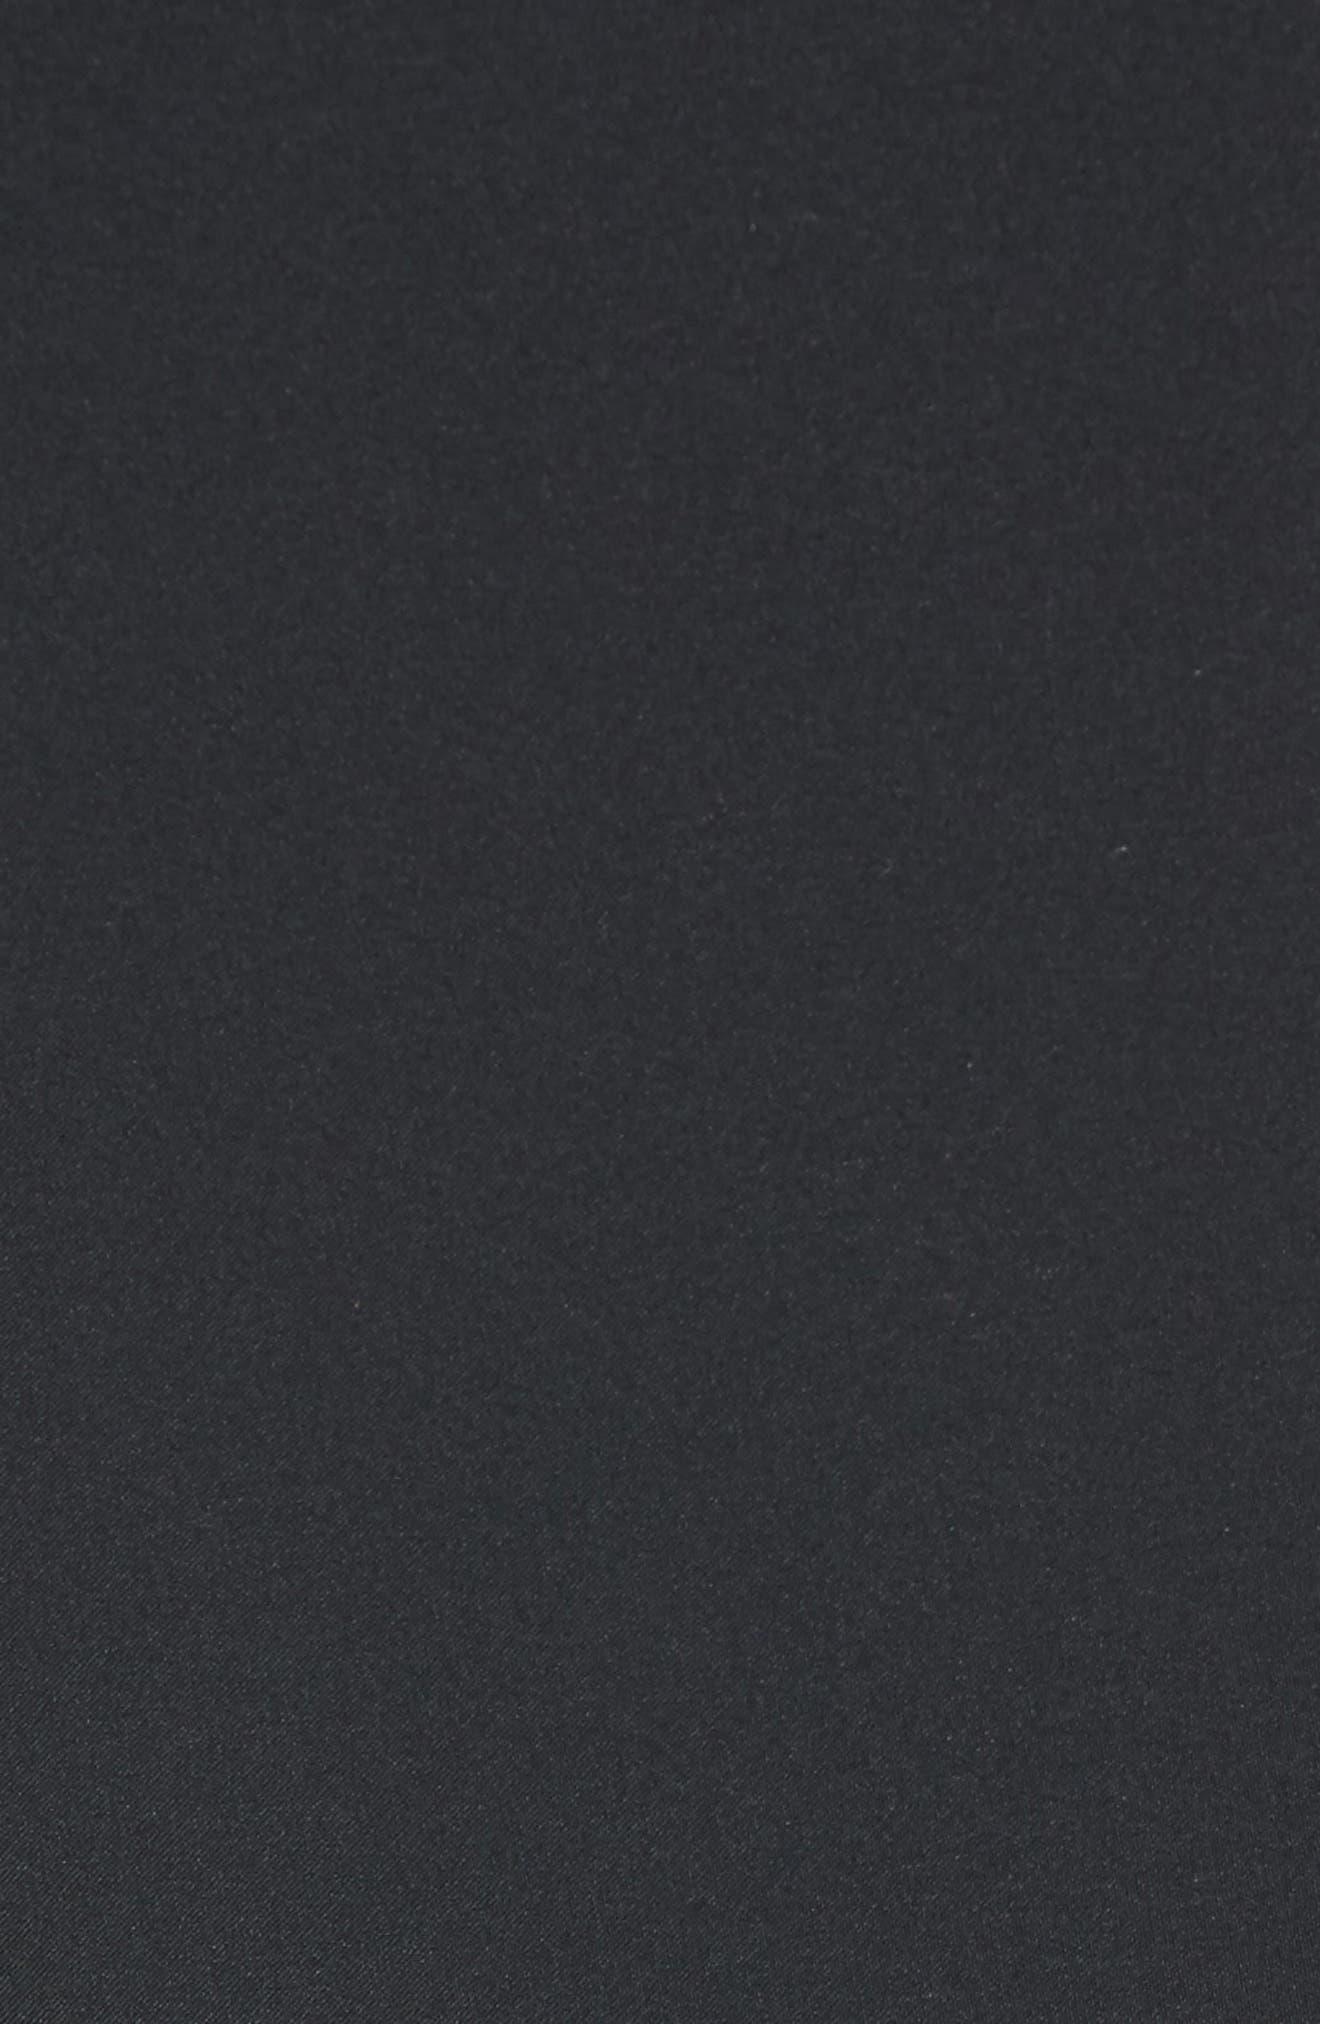 Training Flex PX Shorts,                             Alternate thumbnail 5, color,                             BLACK/ WHITE/ WHITE